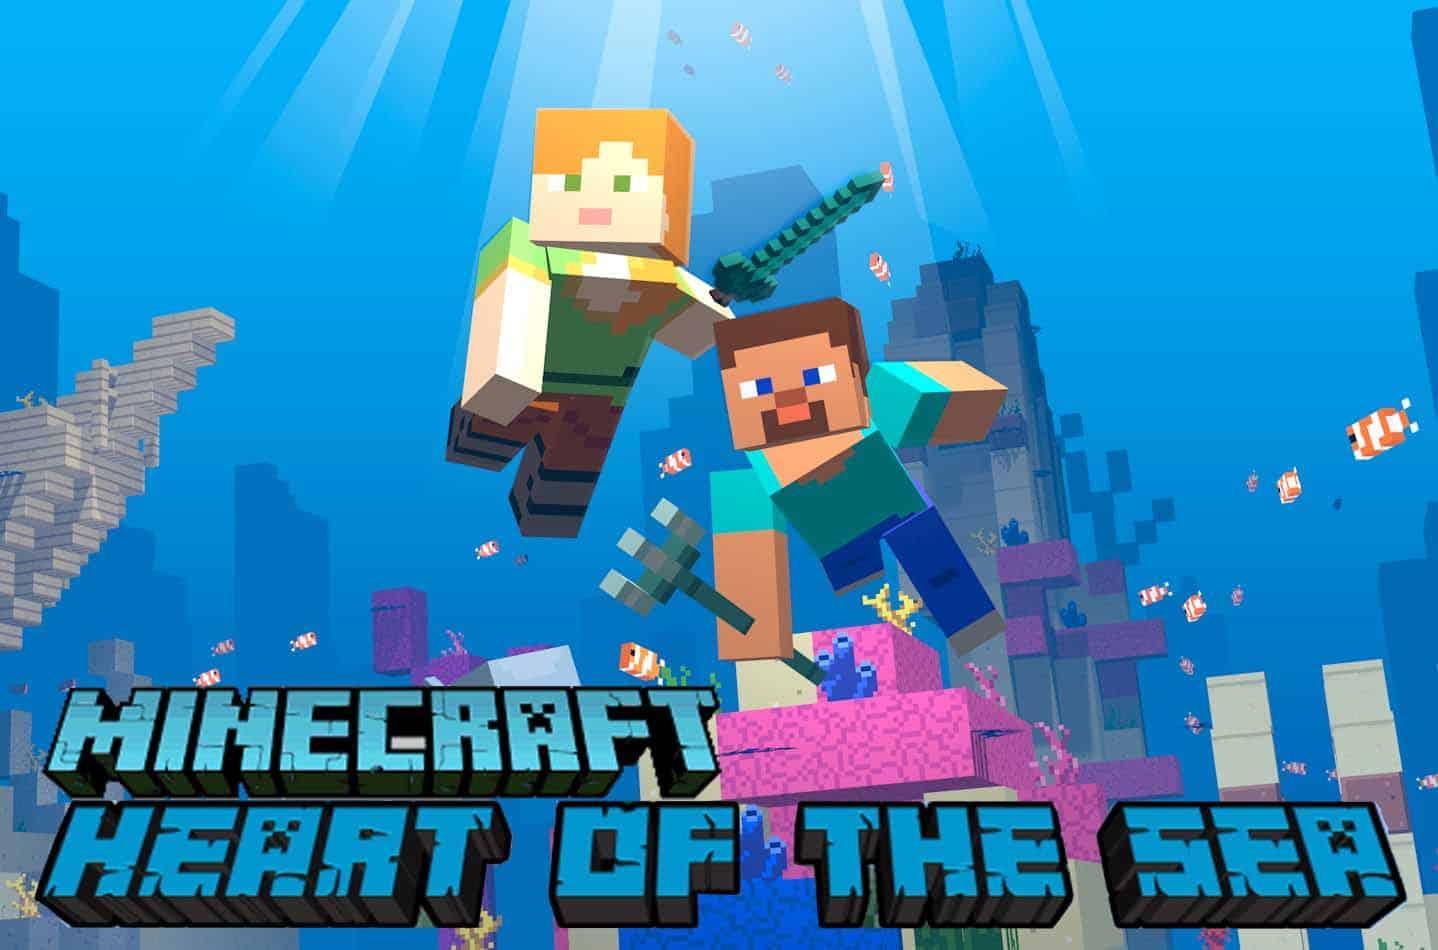 Minecraft Heart of the Sea faet